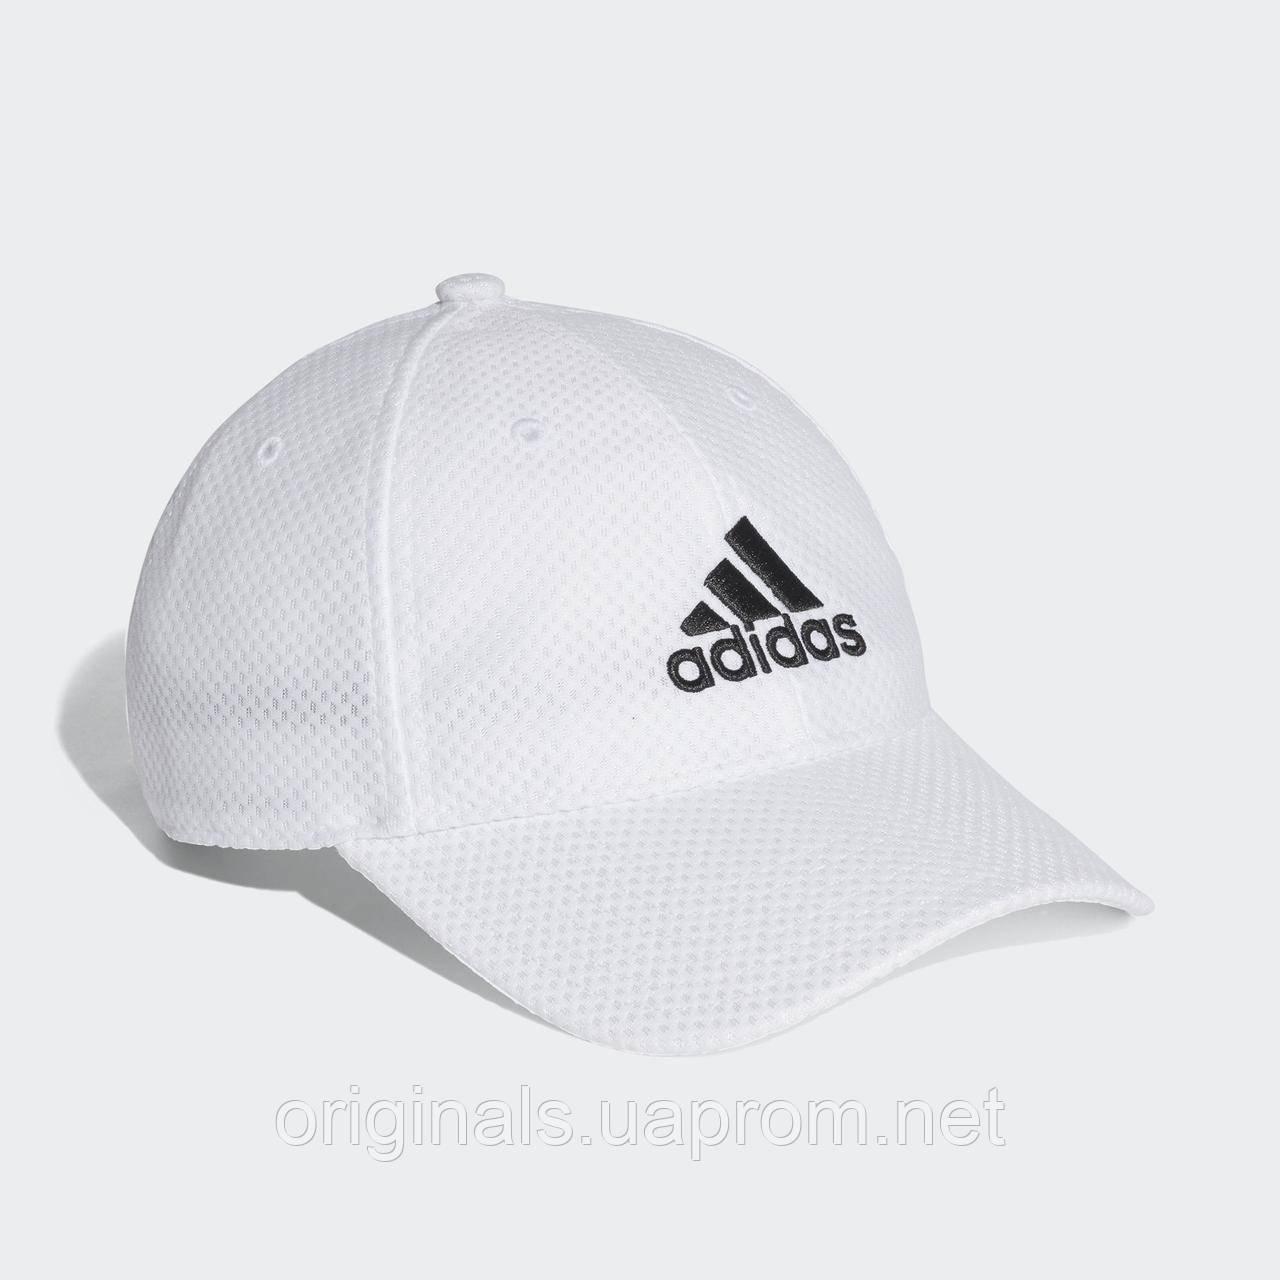 Кепка Adidas C40 Climacool CG1787